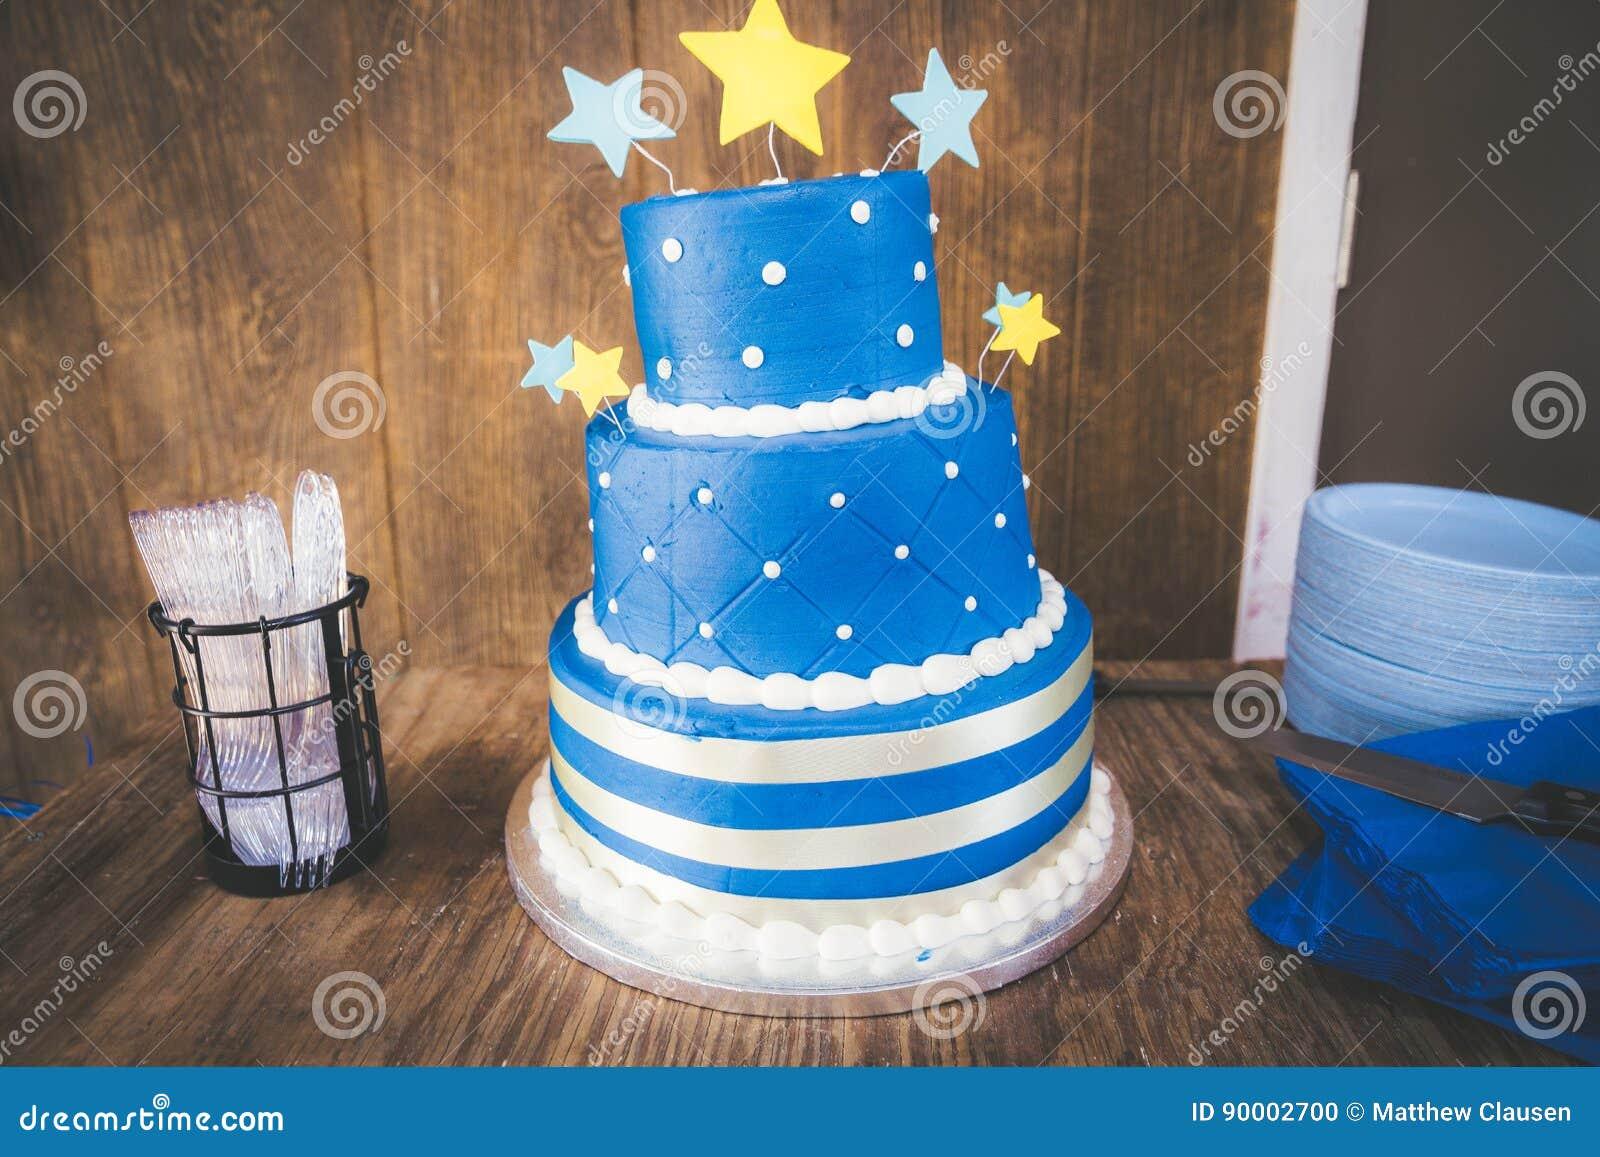 Wondrous Blue Star Birthday Cake Stock Photo Image Of Frame Baby 90002700 Personalised Birthday Cards Veneteletsinfo